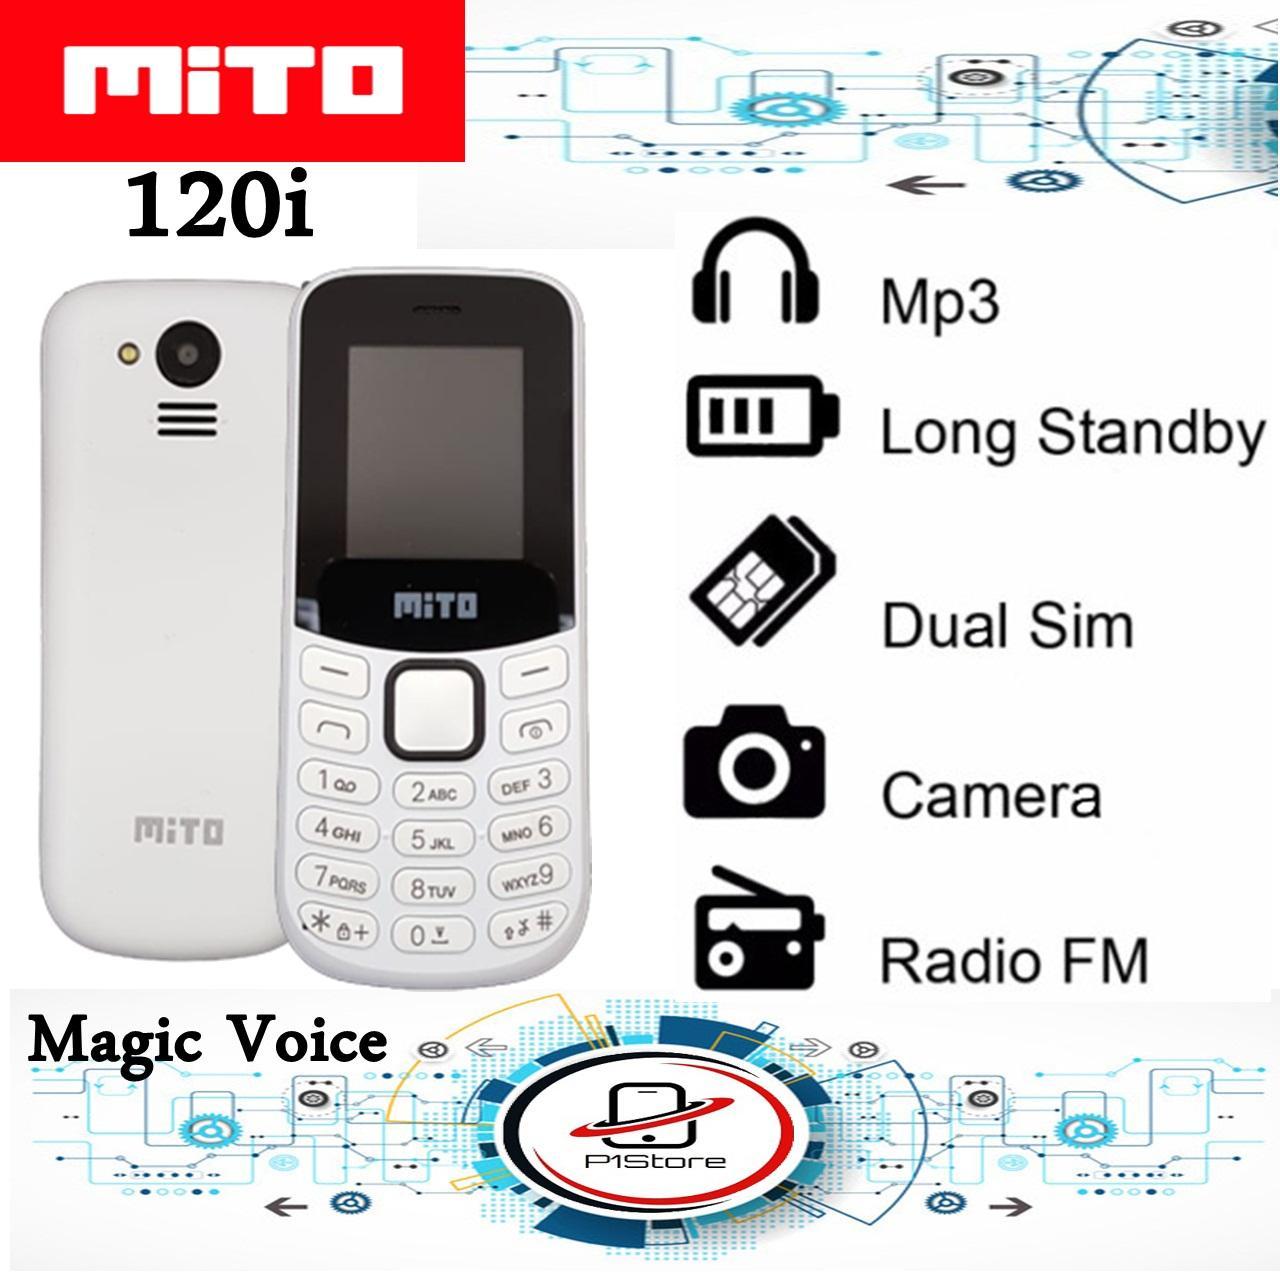 Handphone Mito Lengkap Murah A39 Ram 3gb Gold 120i Dual Simcard Magic Voice